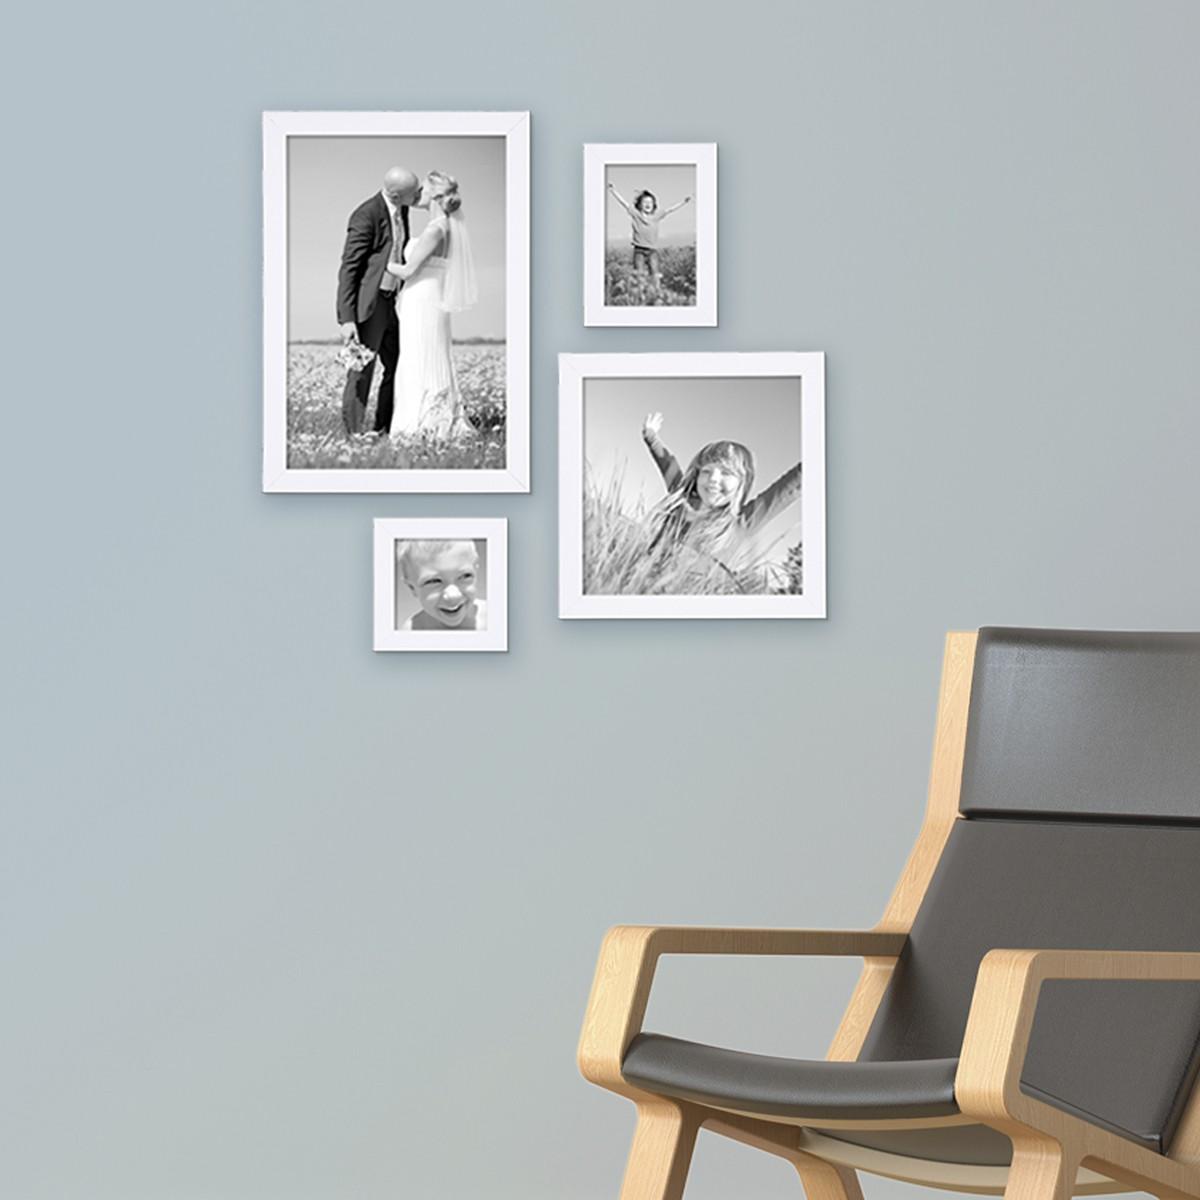 Fotowand Bilderrahmen 4er set bilderrahmen weiss modern aus mdf je einmal 10x10 10x15